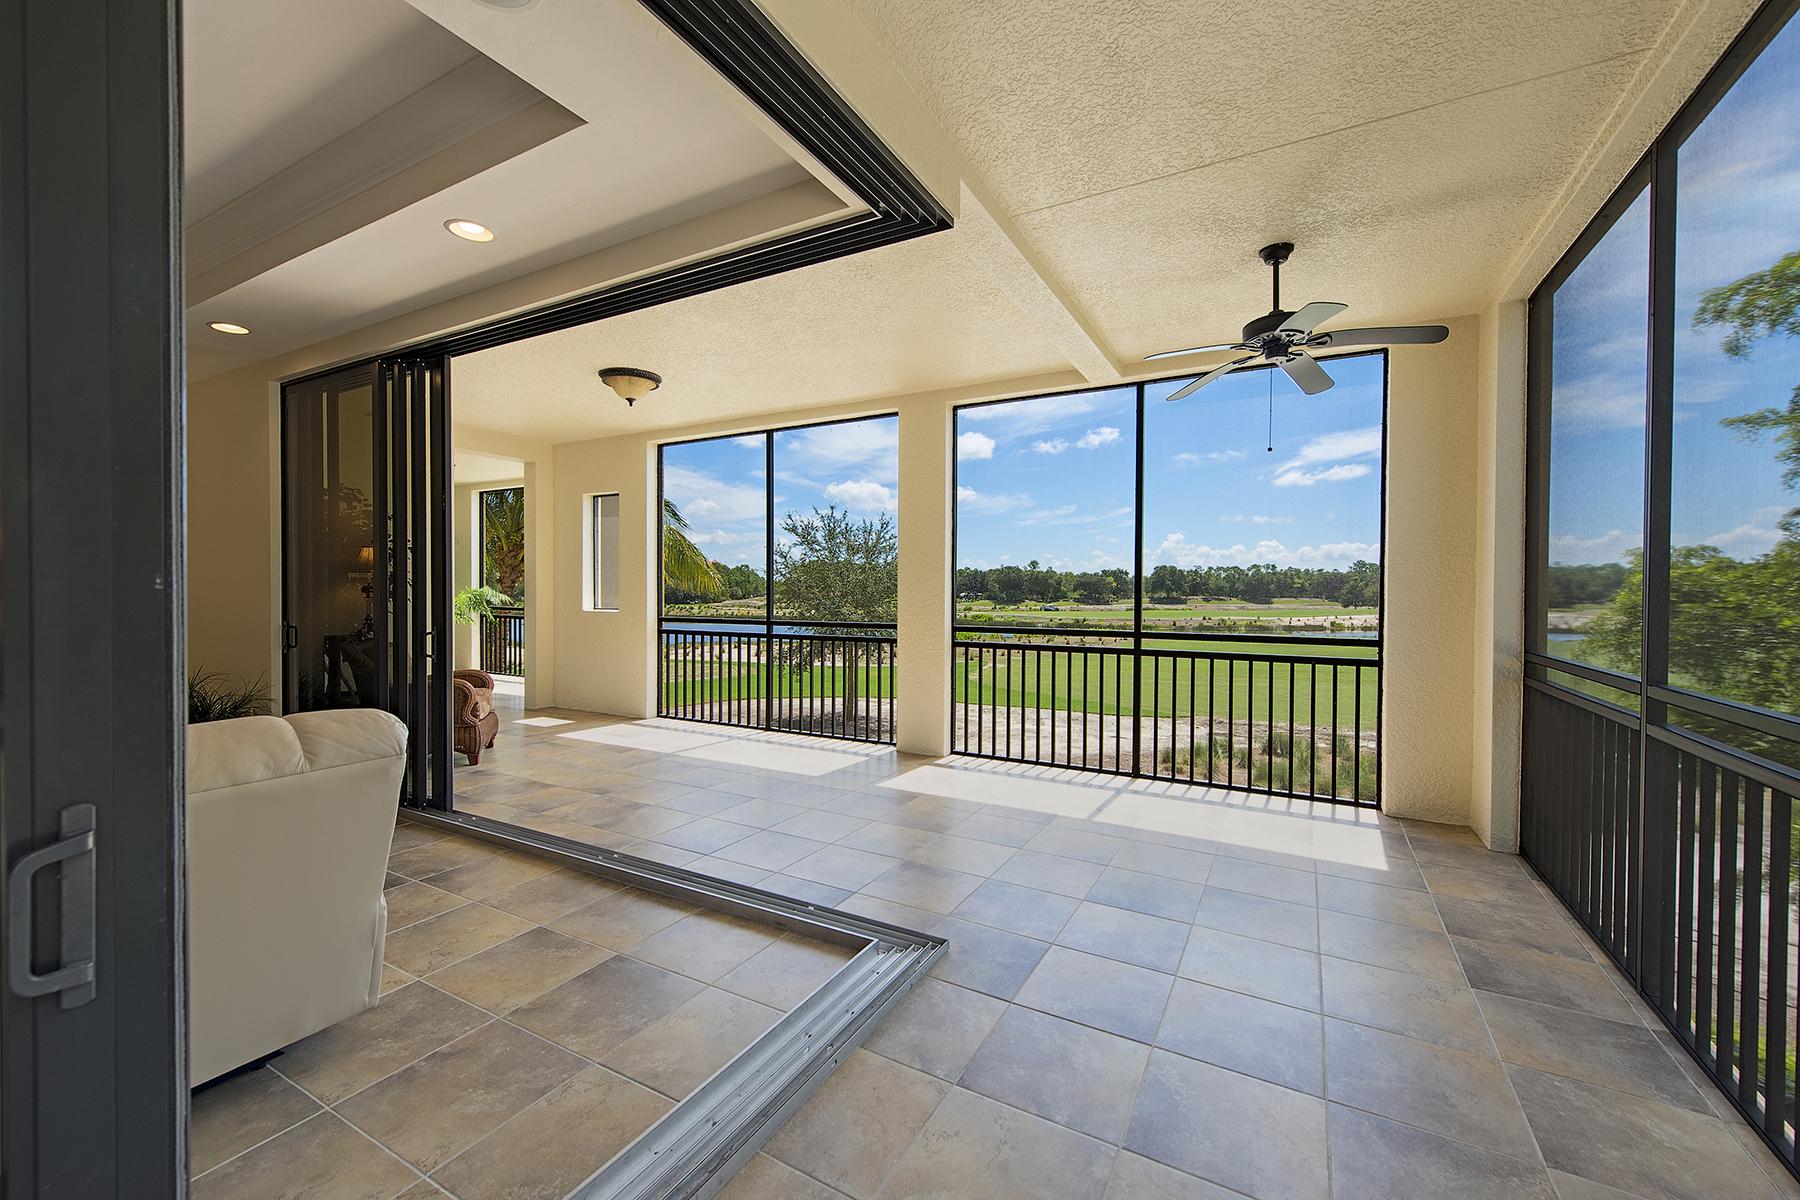 Condominio por un Venta en TIBURON - MARQUESA ROYALE 2538 Marquesa Royale Ln 5-102 Naples, Florida, 34109 Estados Unidos